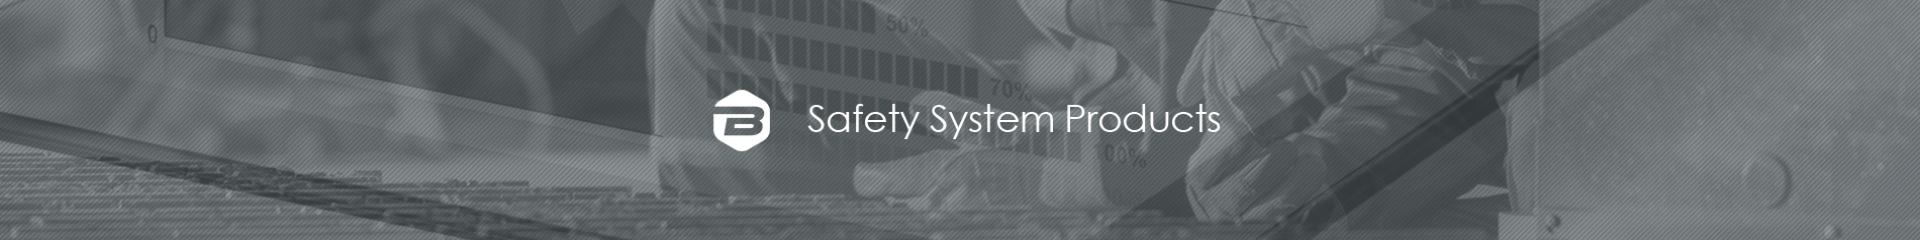 bulwark-safety-banner